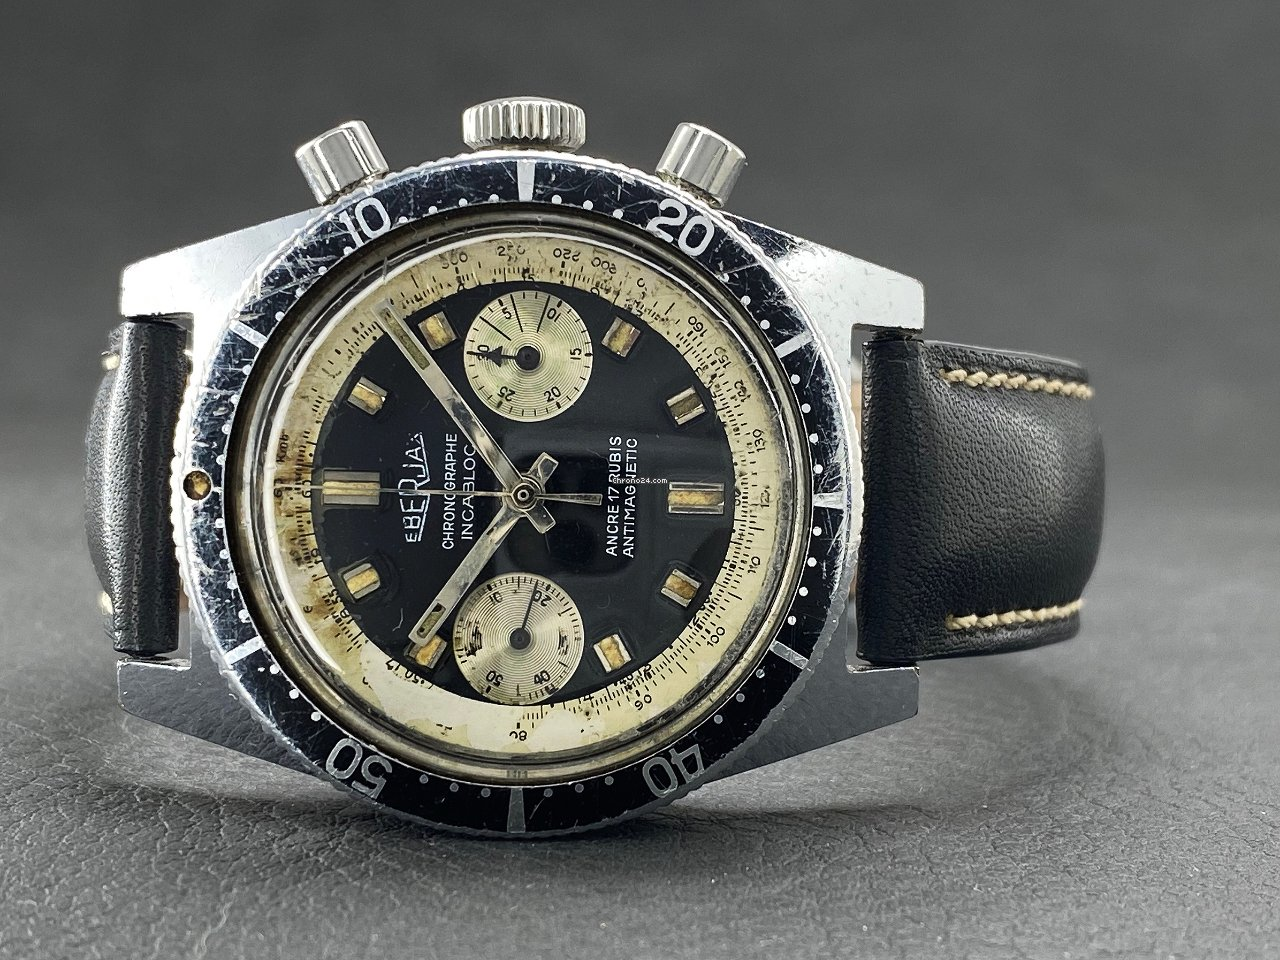 Eberjax Chronographe 17jewels - Landeron 248 | 70's 1970 pre-owned